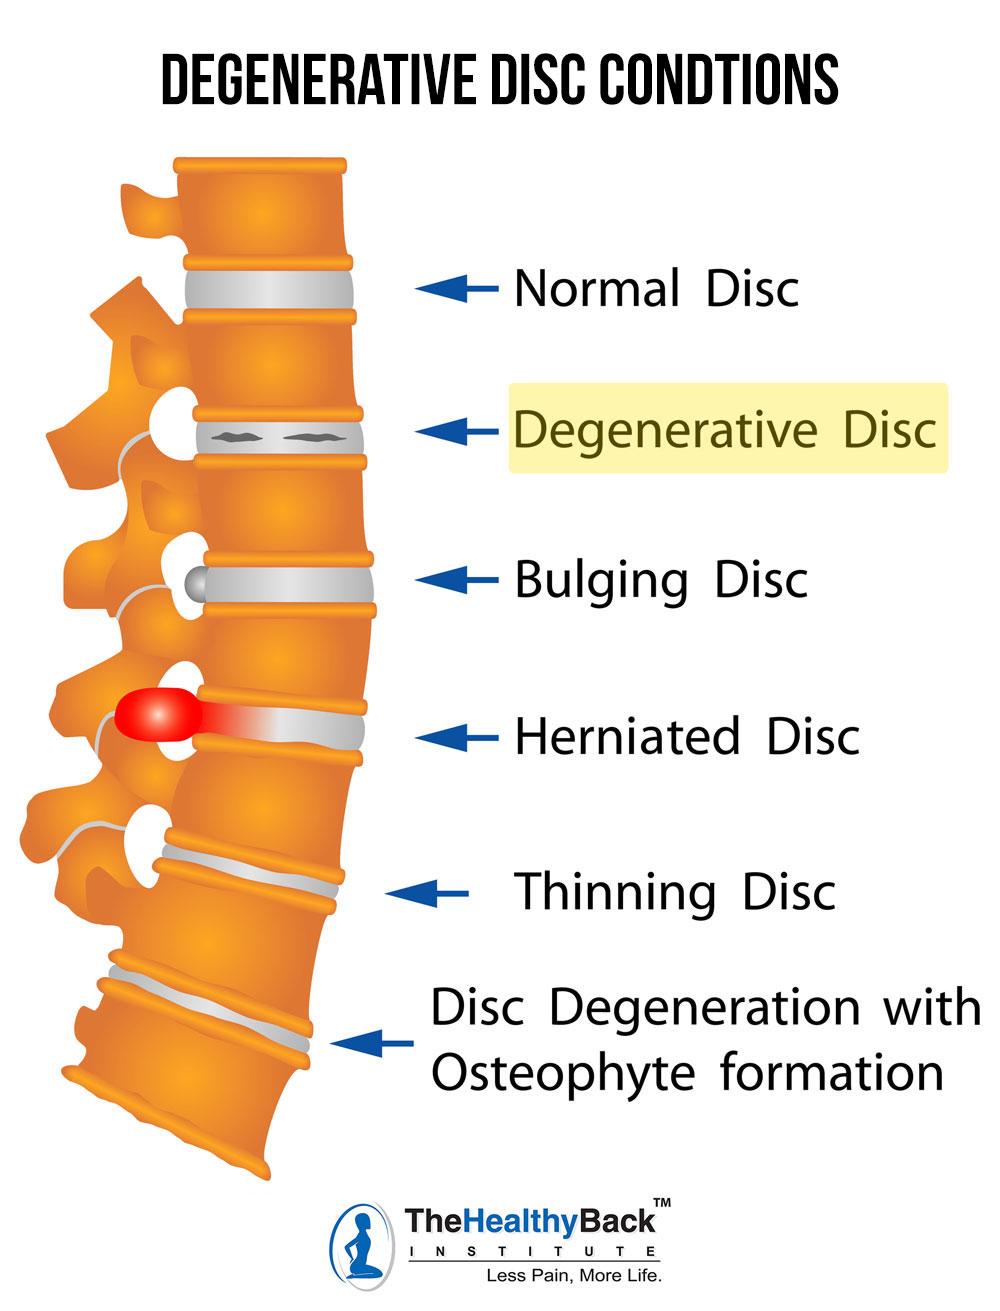 degenerative disc disease, degenerative disc conditions